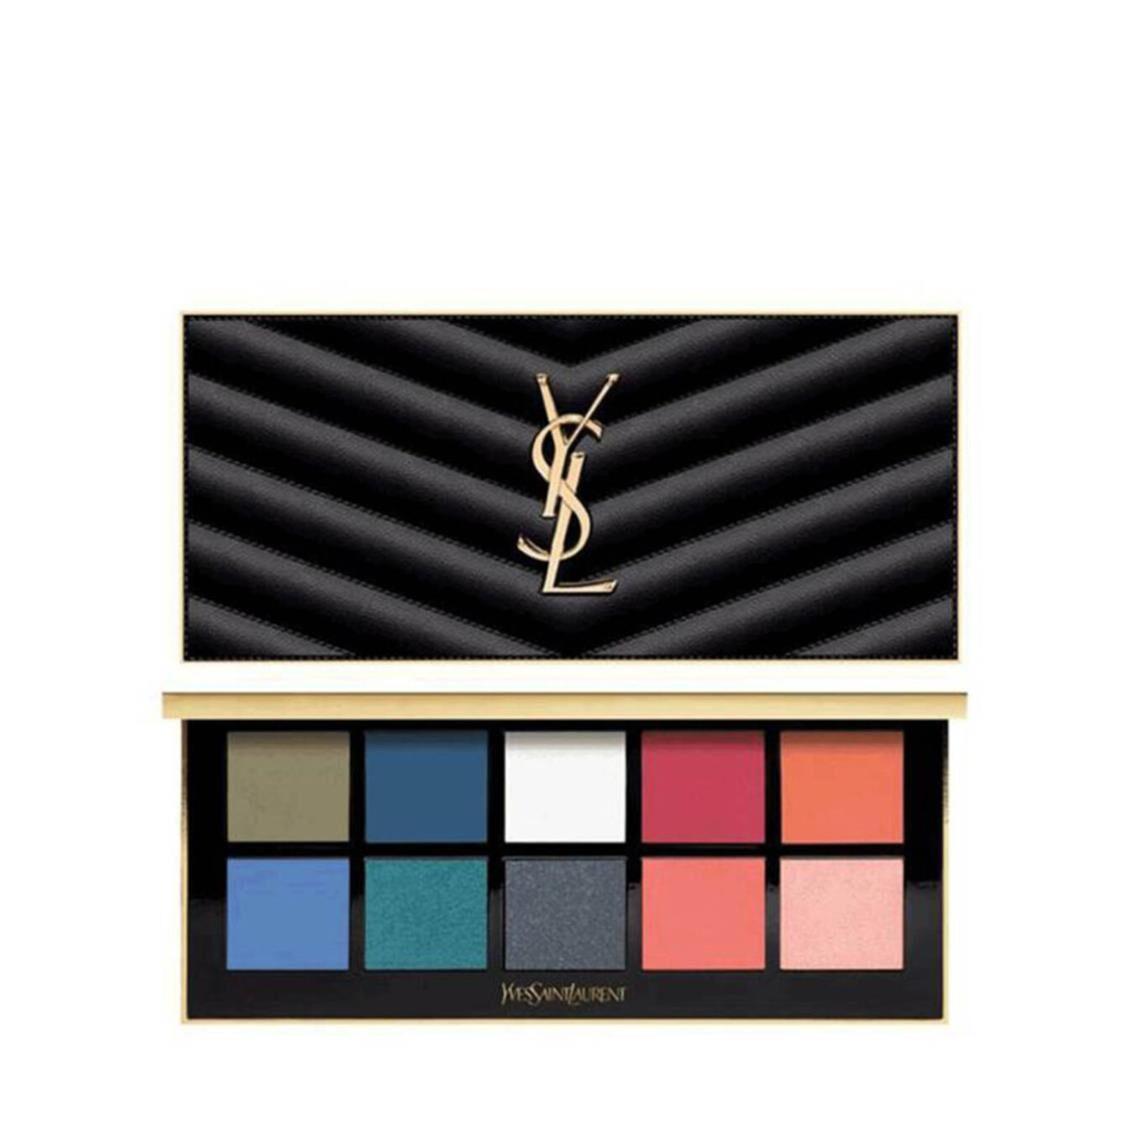 Yves Saint Laurent Beaute Couture Clutch Eyeshadow Palette Marrakesh